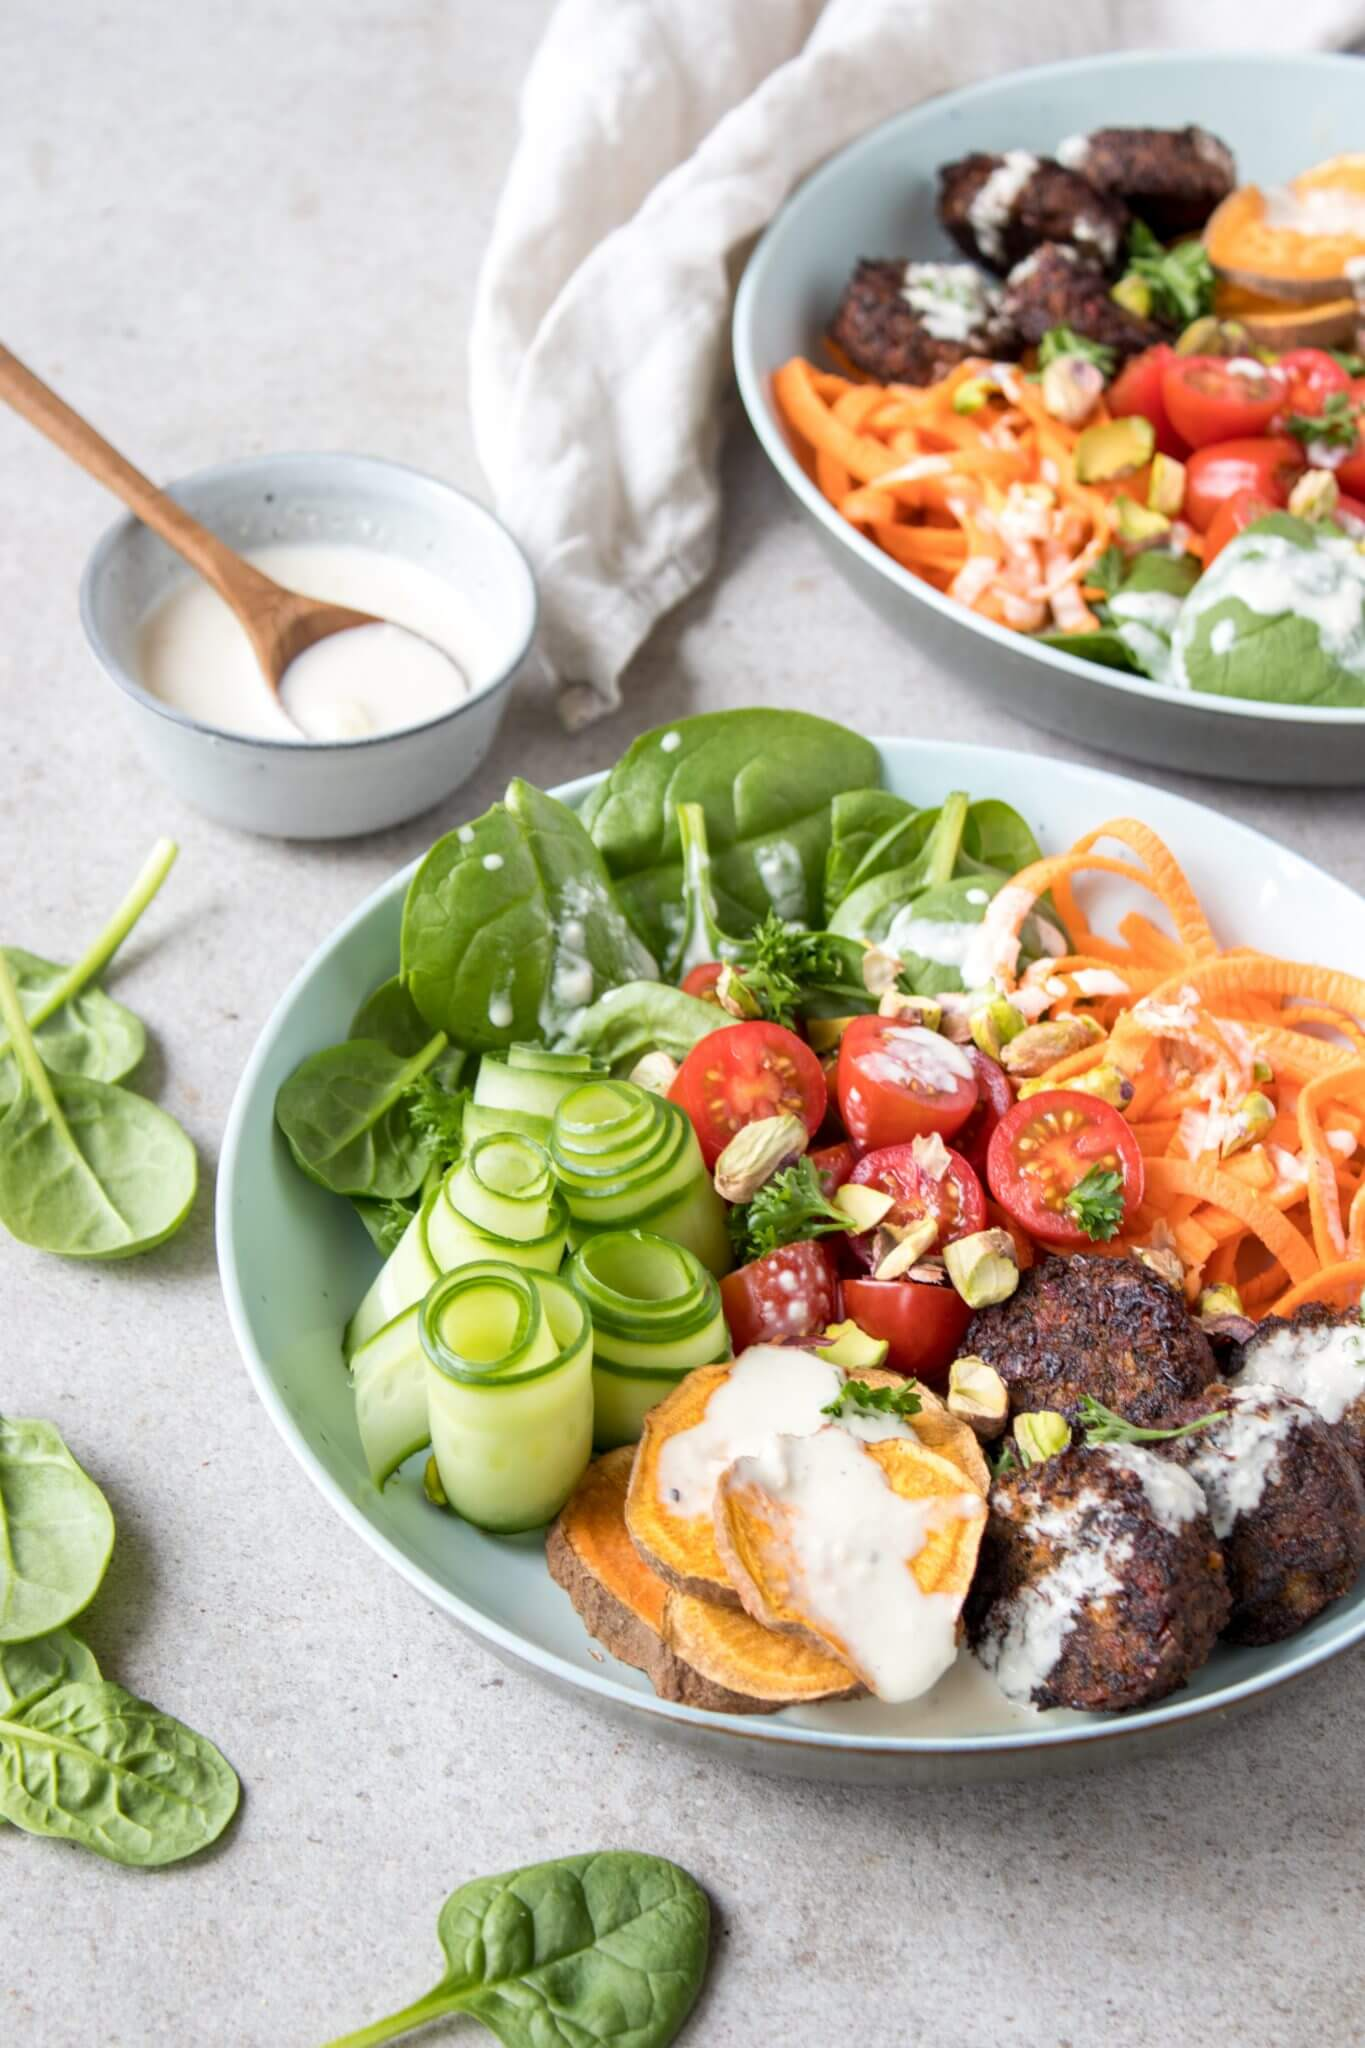 falafel-salade-knoflook-dressin